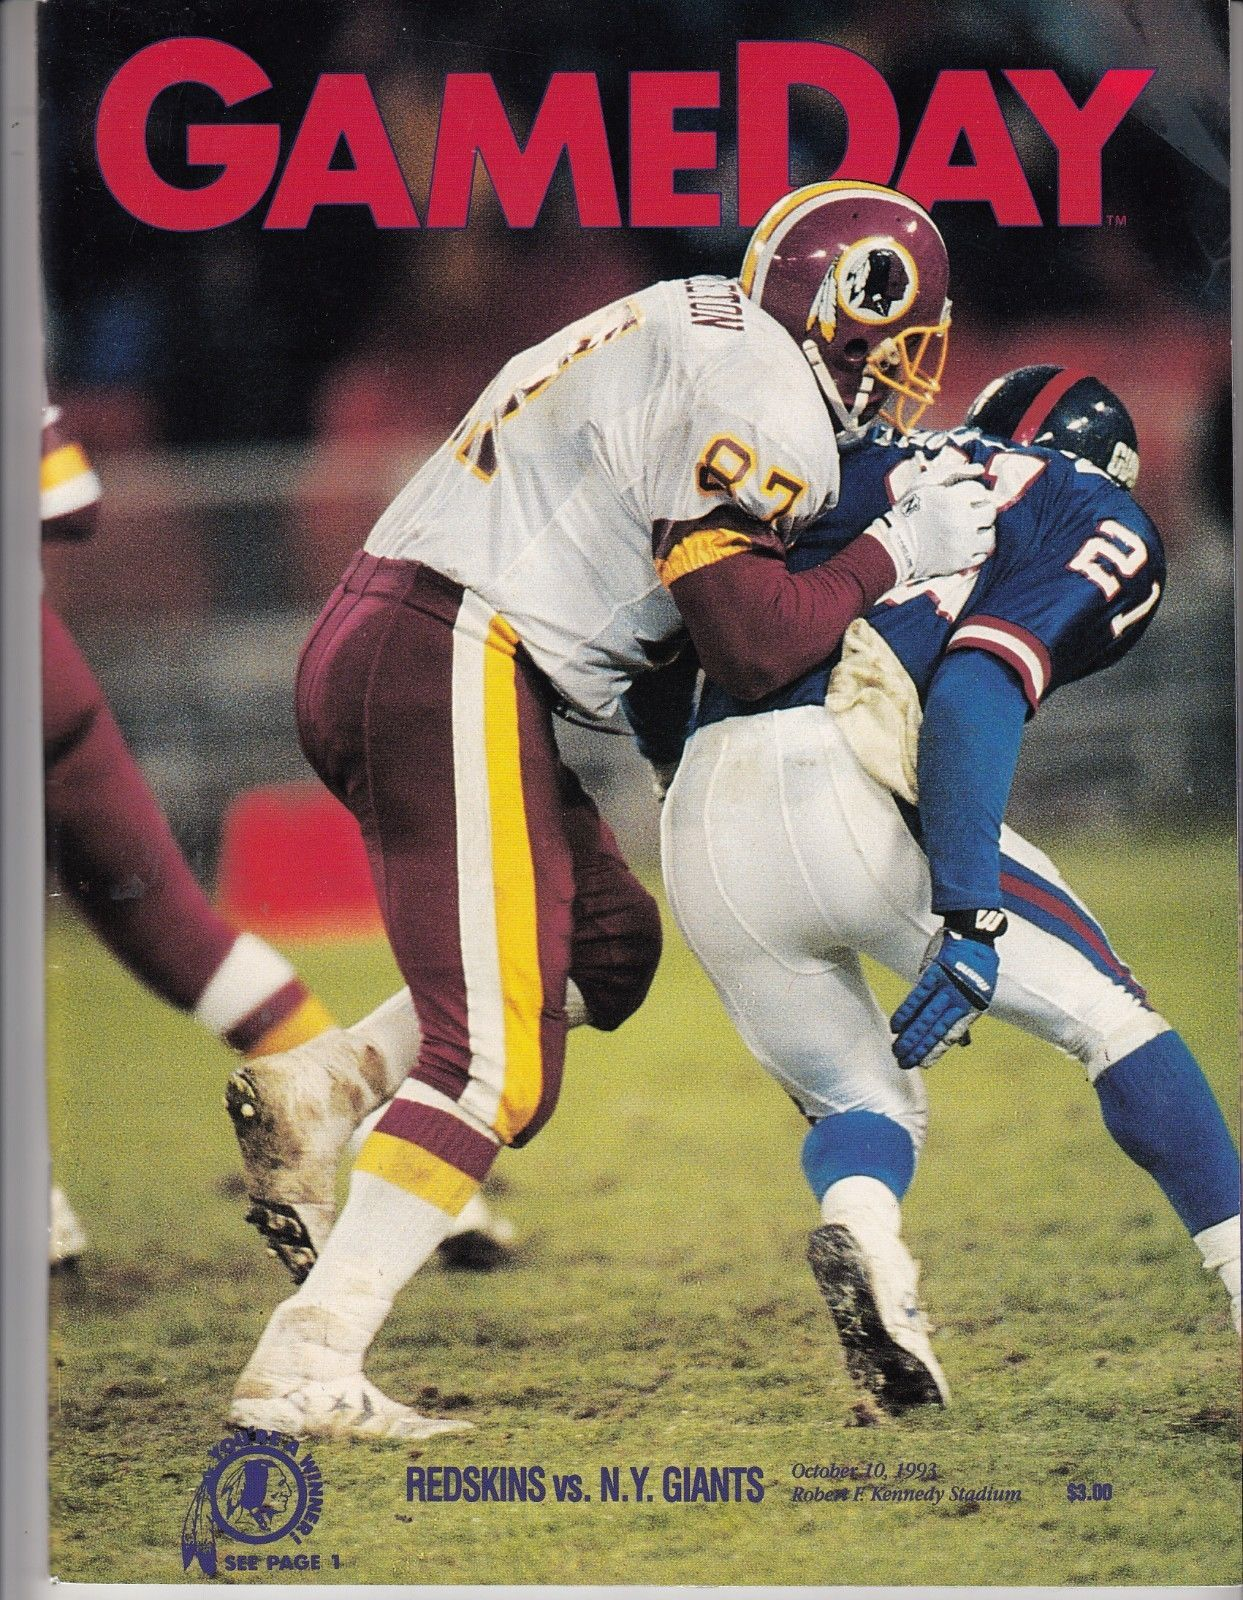 NFL Gameday Program Redskins vs Giants October 10 1993 RFK